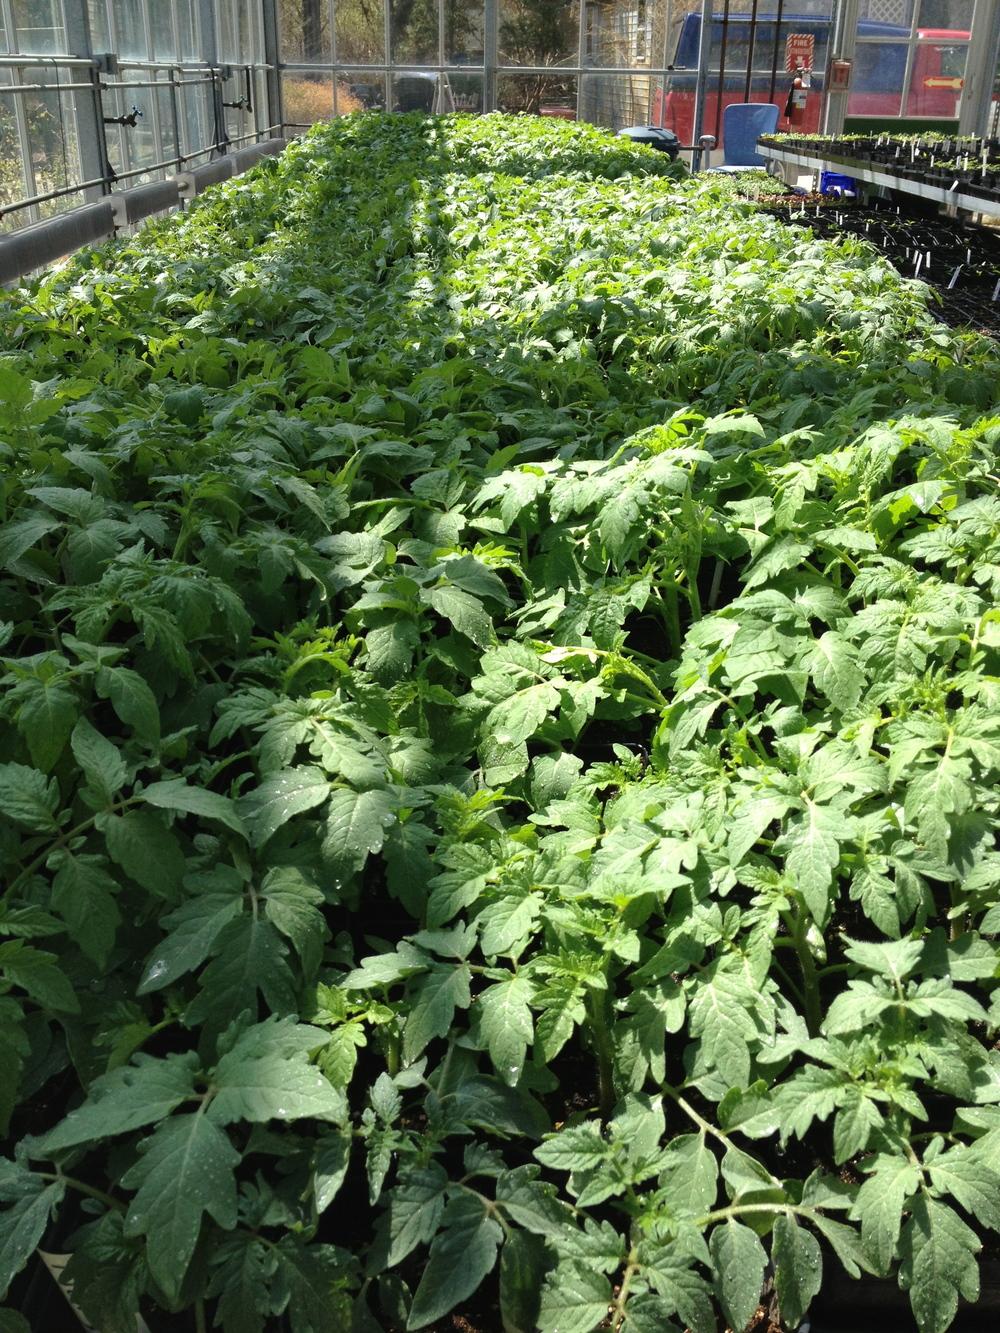 tomatoplants.jpg